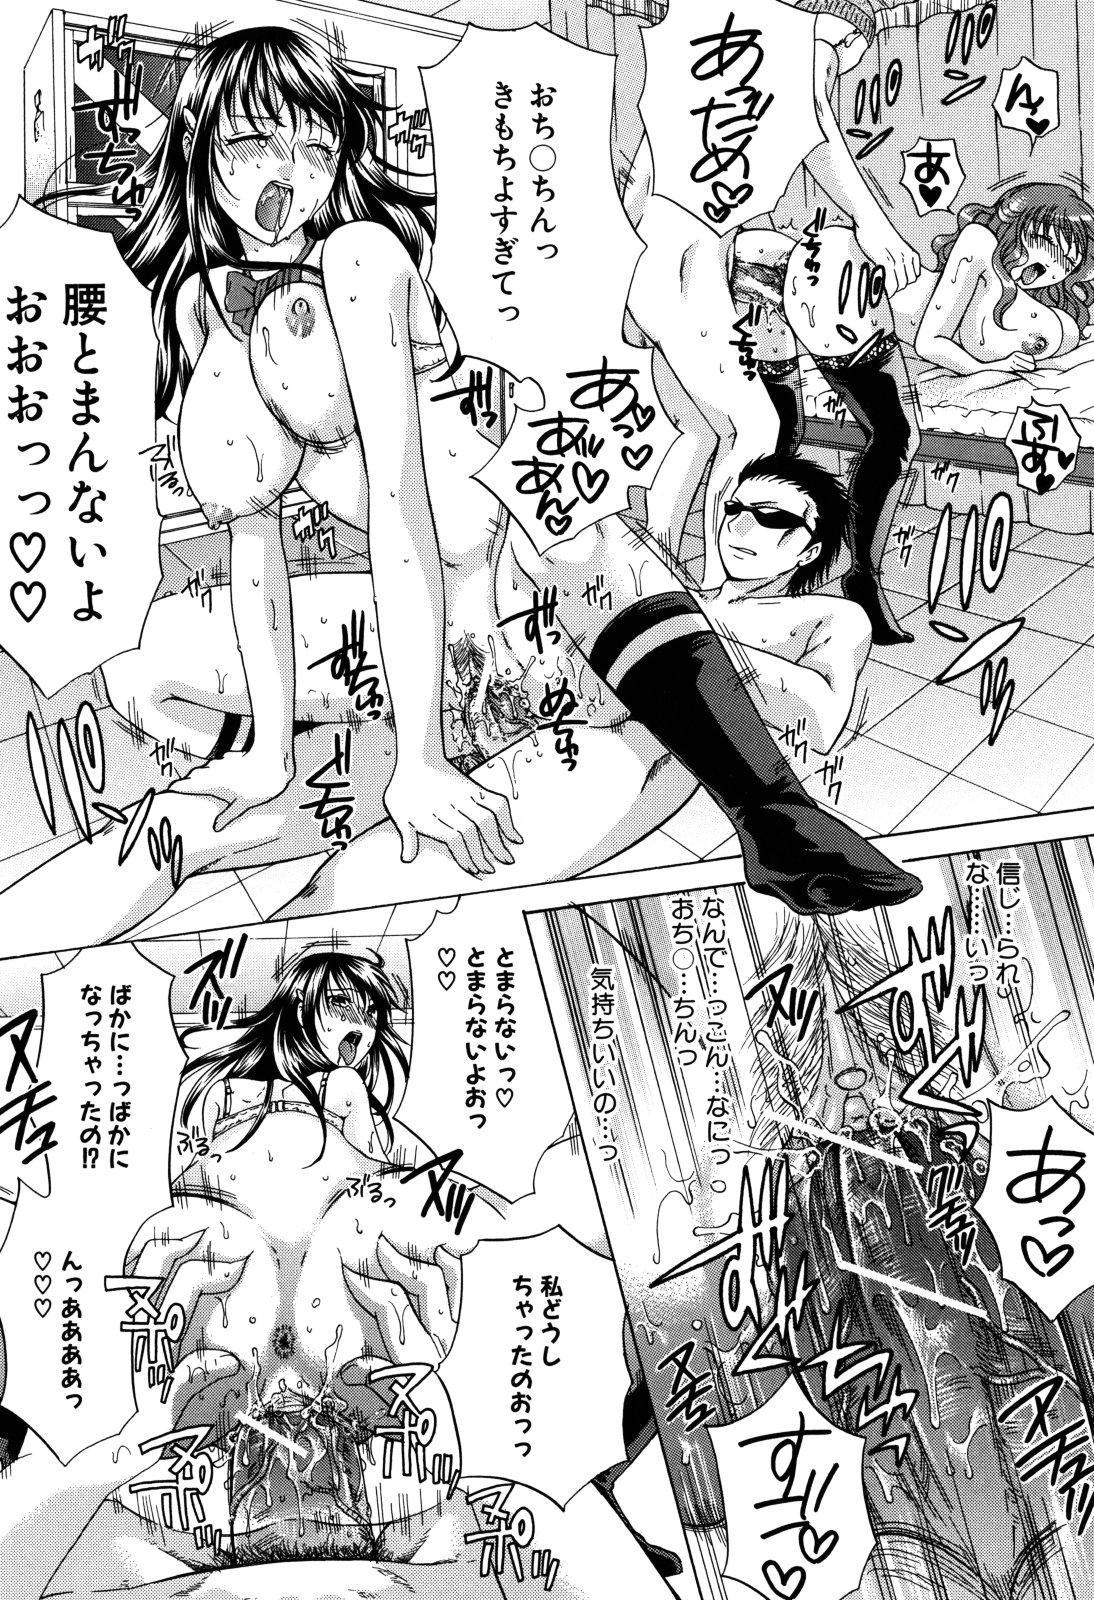 Kanojo ga Ochiru made - She in the depth 195